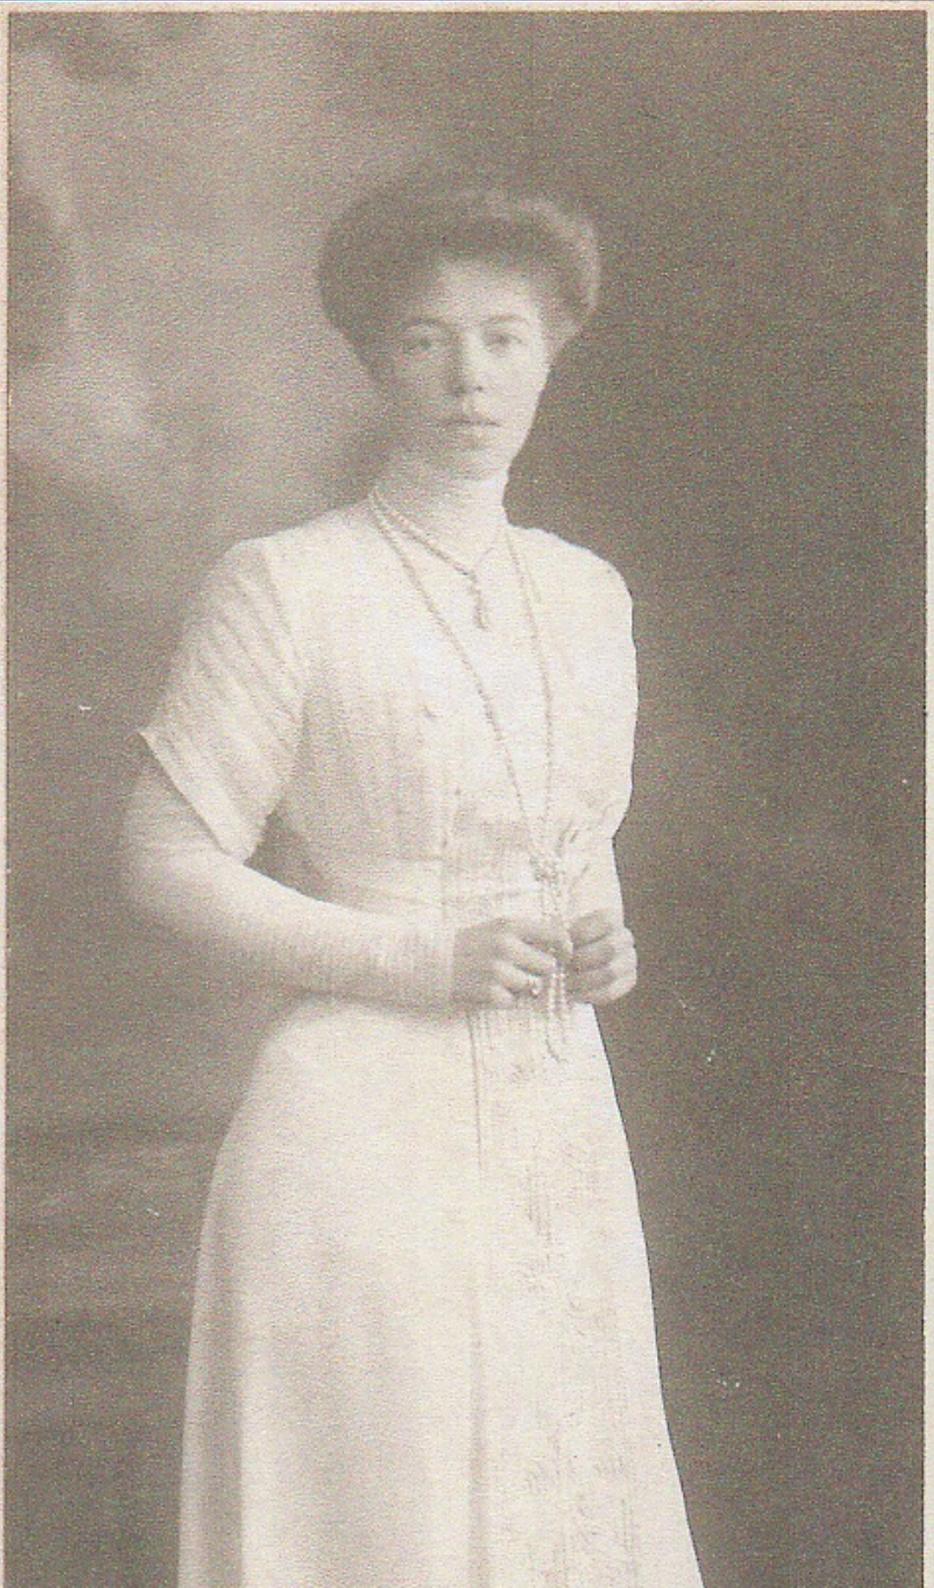 Royalty Grand Duchess Olga Correspondence To Her Sister Grand Duchess Xenia 1916-1920